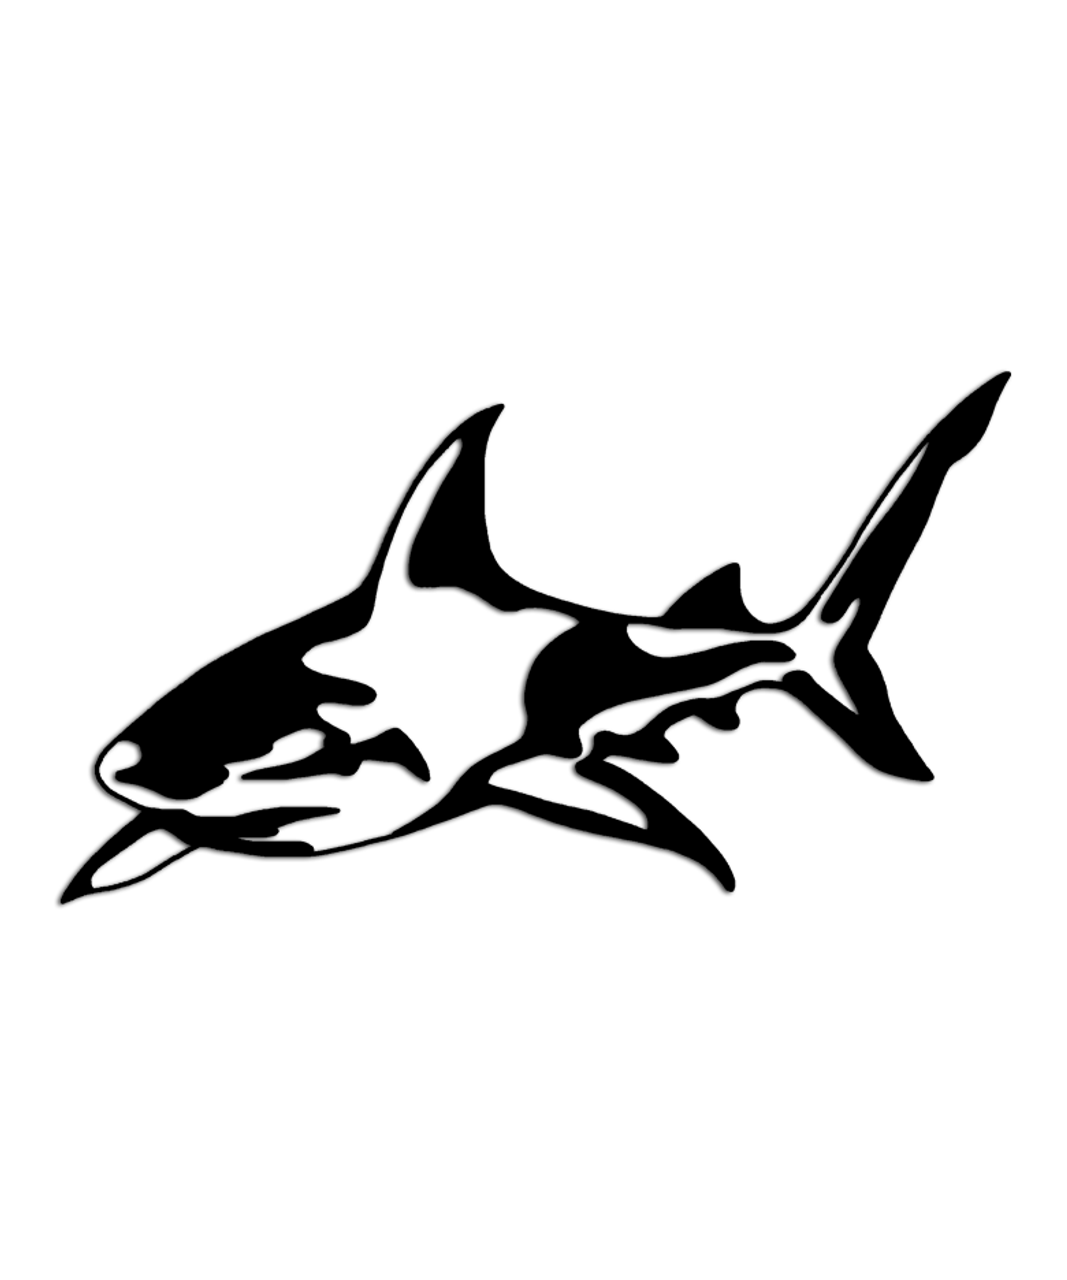 Shark Stalker Ocean Beach Sticker Aftershock Decals